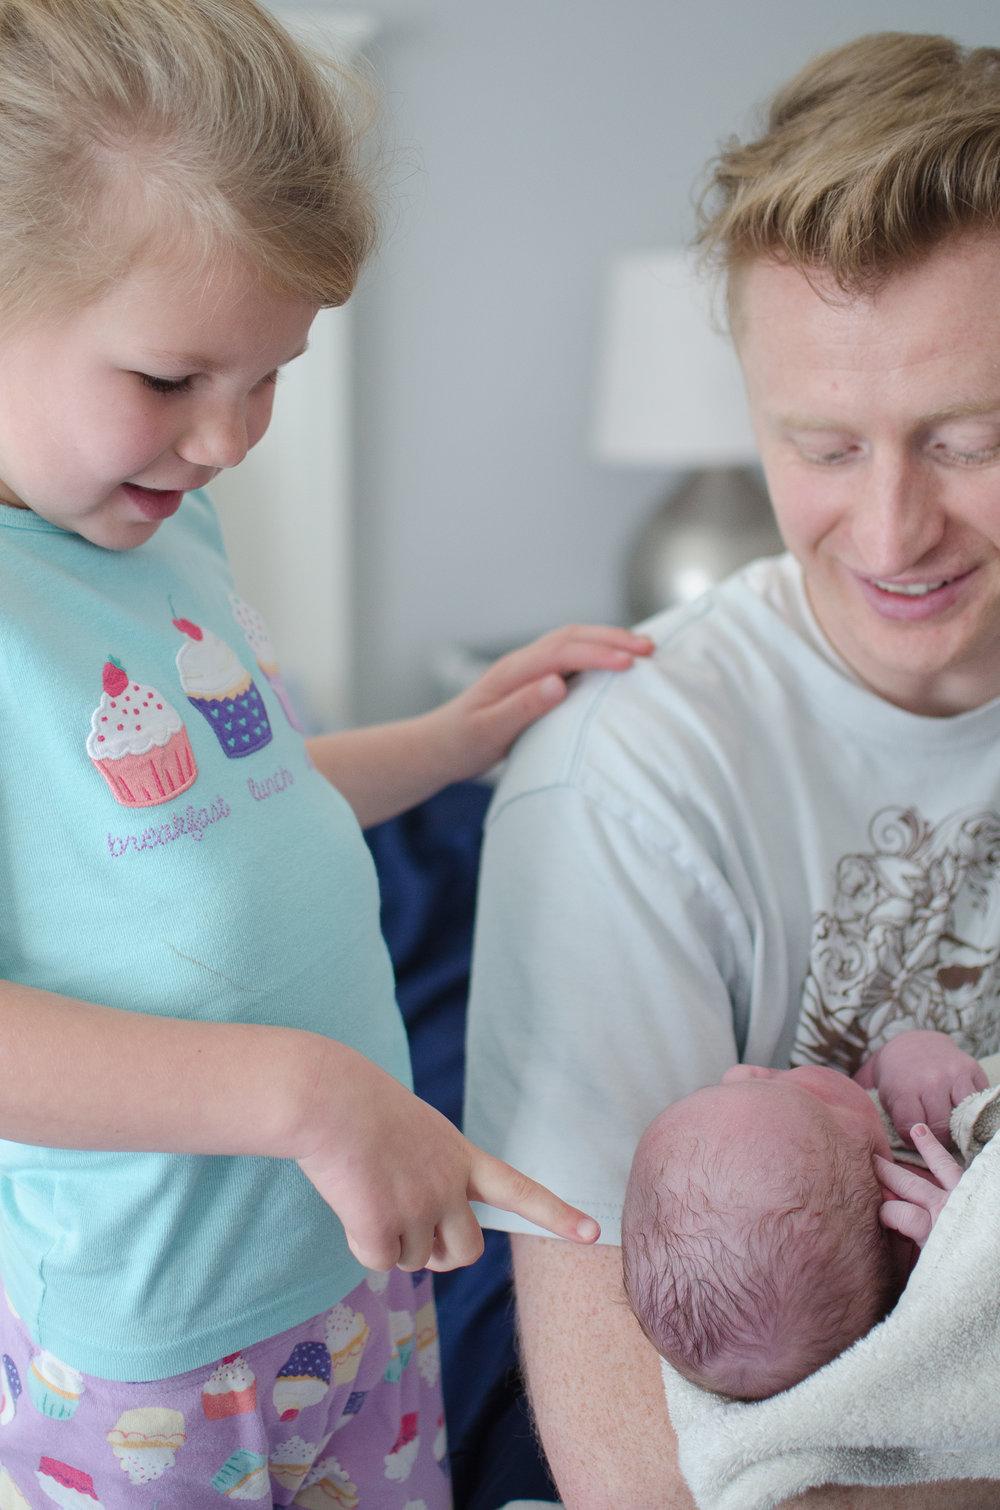 Natural Childbirth, jennoldham.com